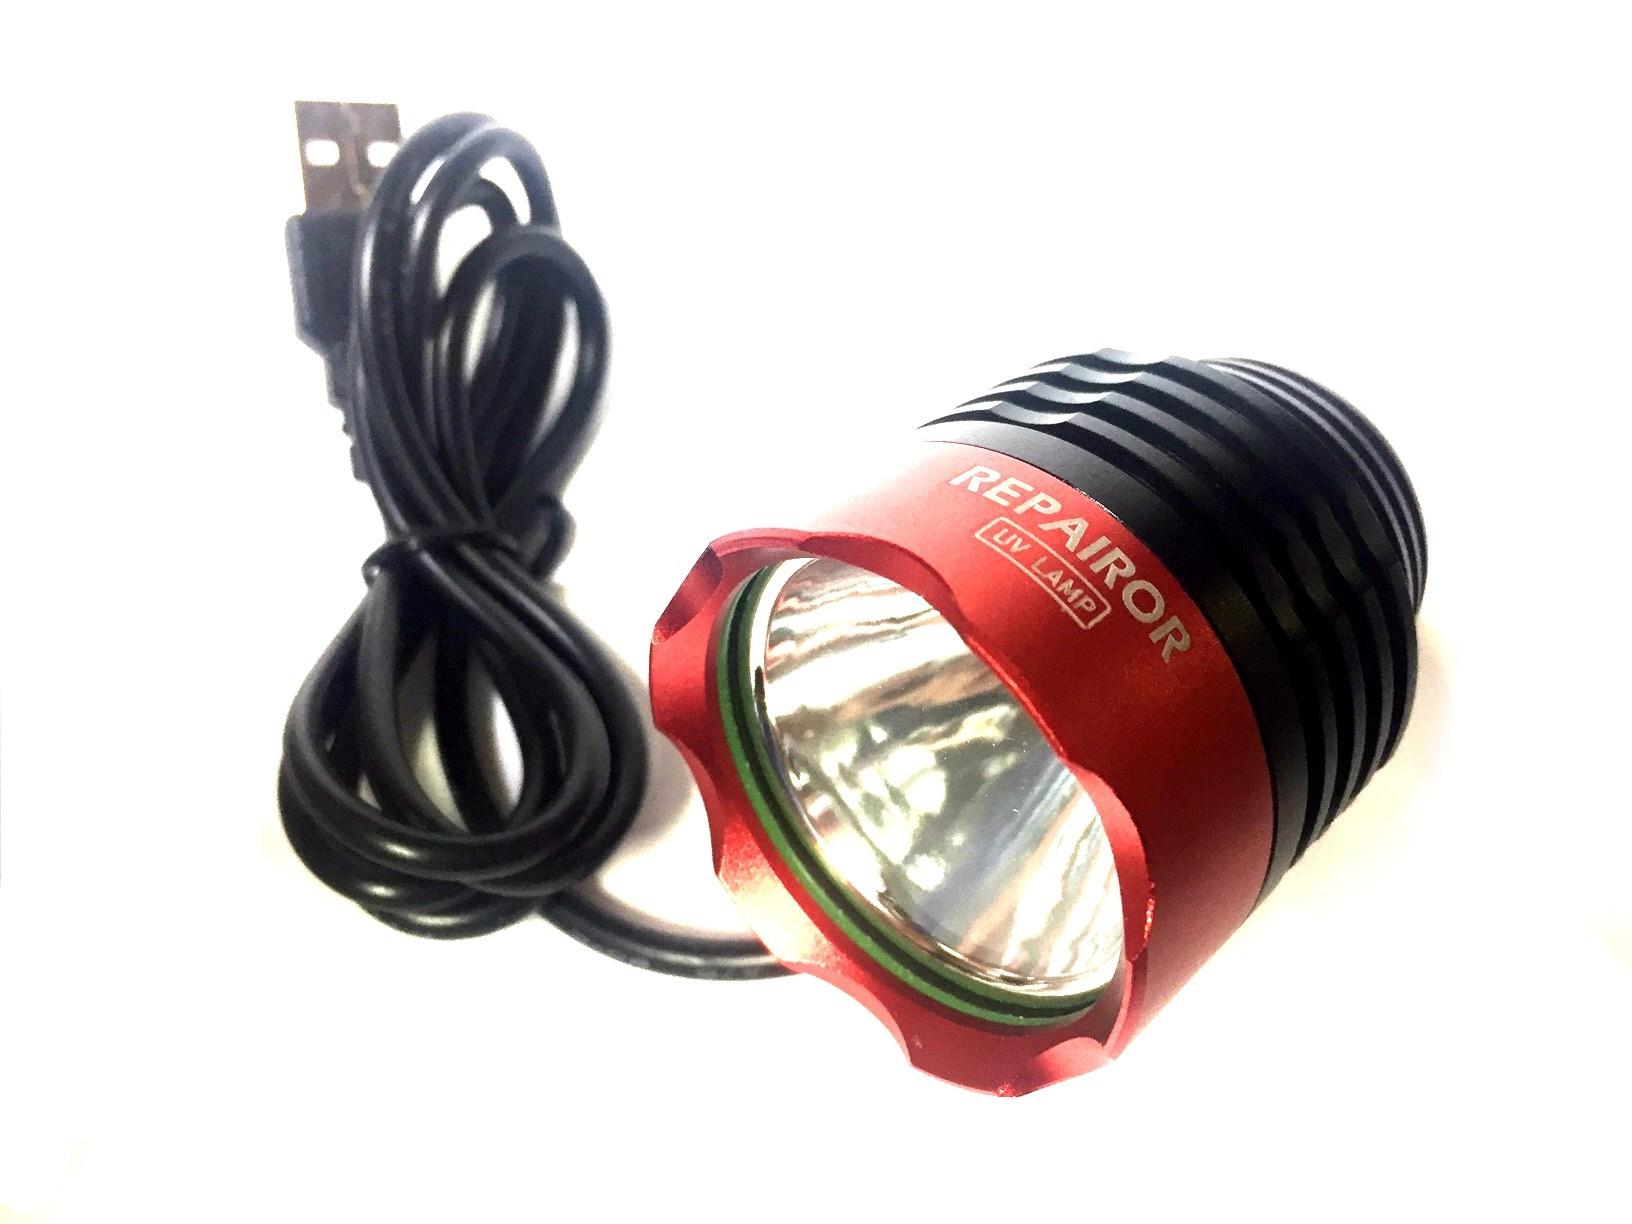 REPAIROR 5V 7W Aluminium USB UV Lamp